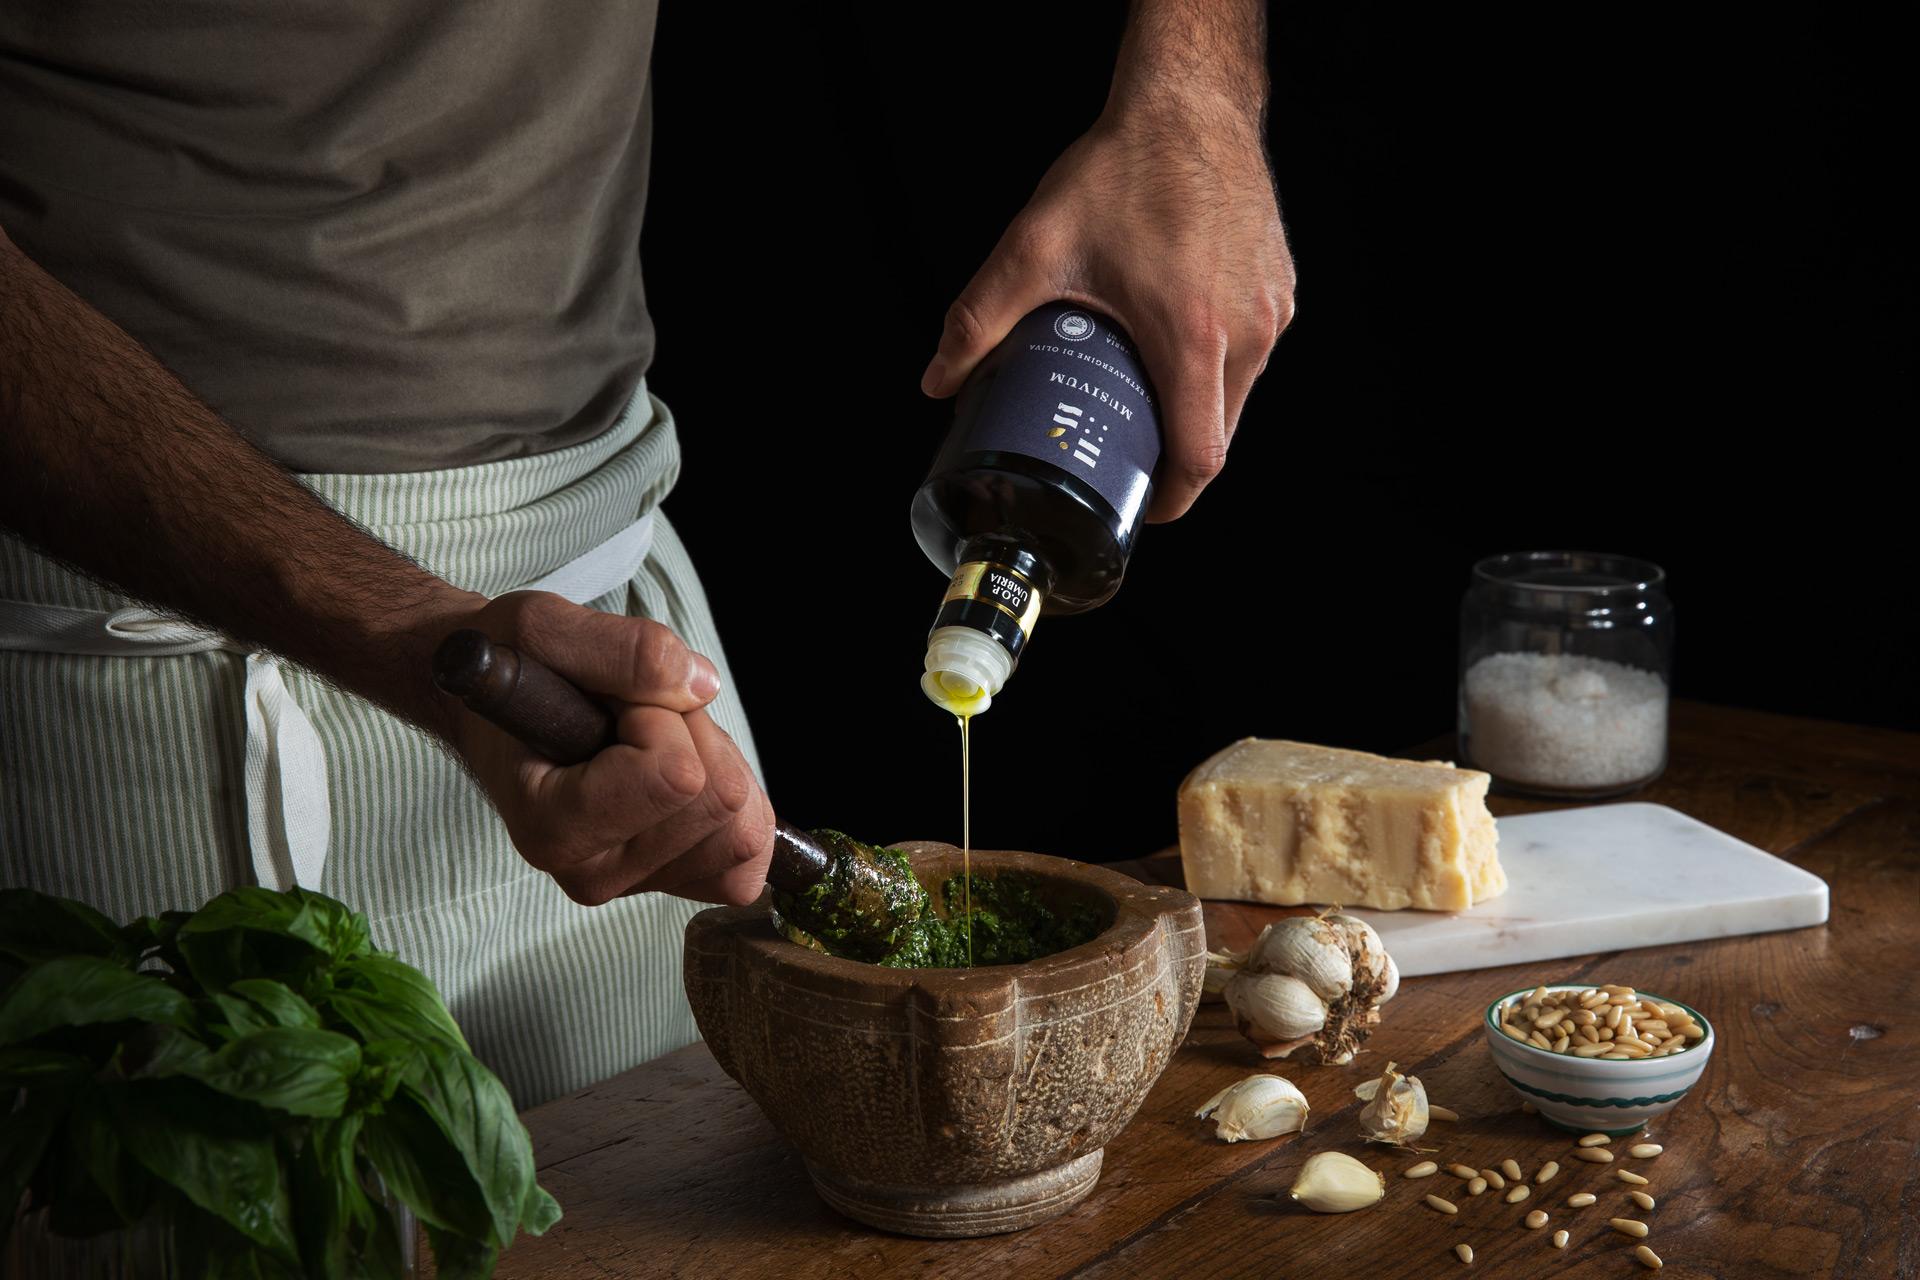 Pesto con pinoli, olio, basilico e parmigiano